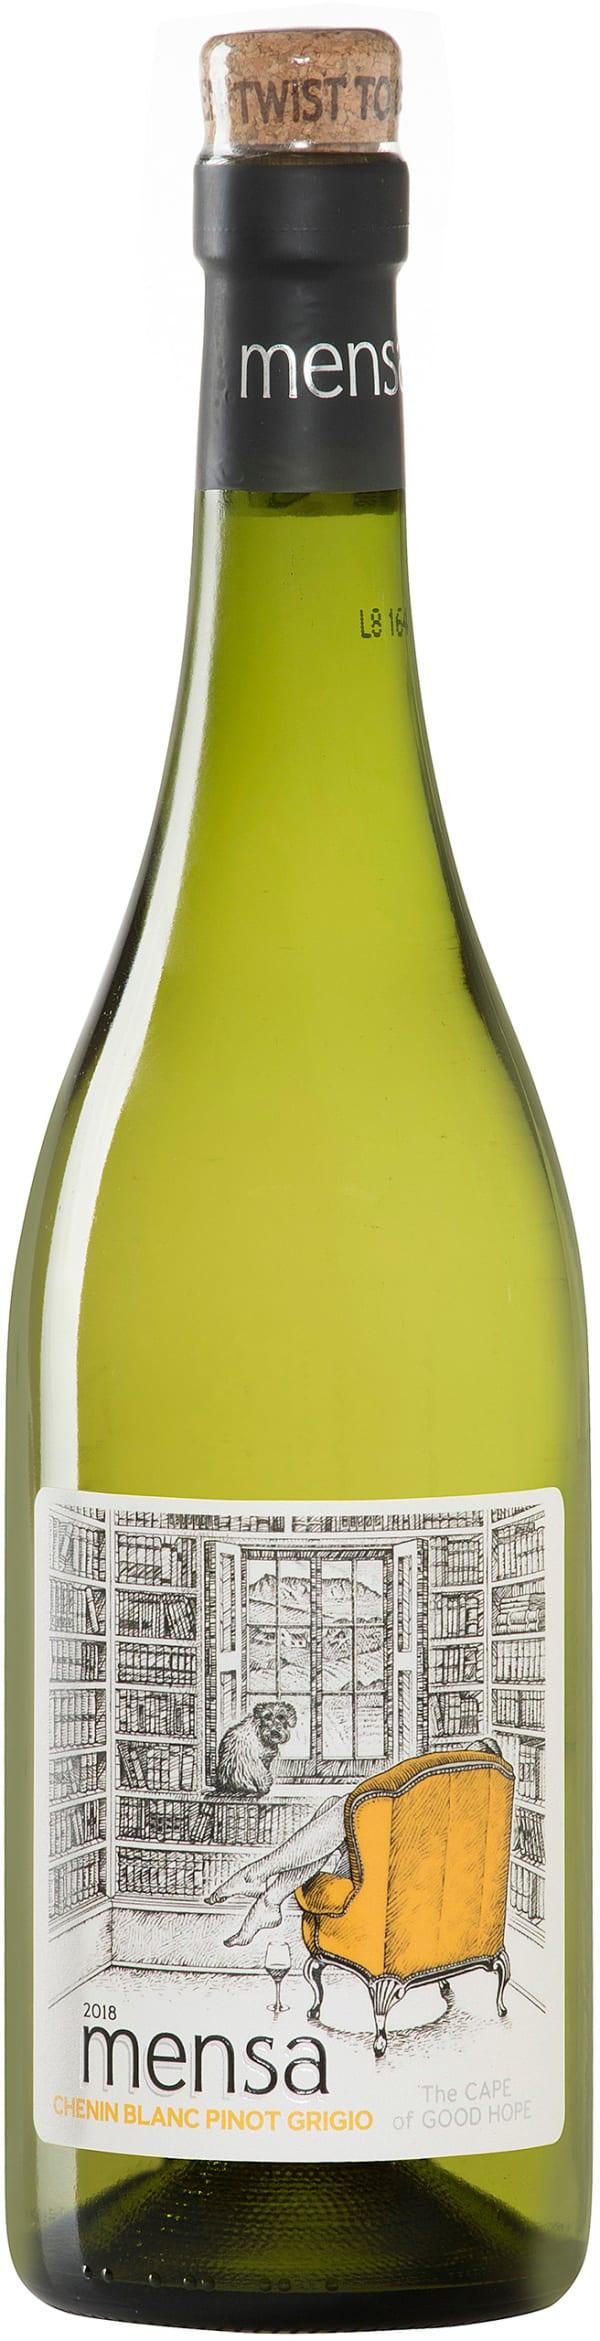 Mensa Chenin Blanc Pinot Grigio 2018